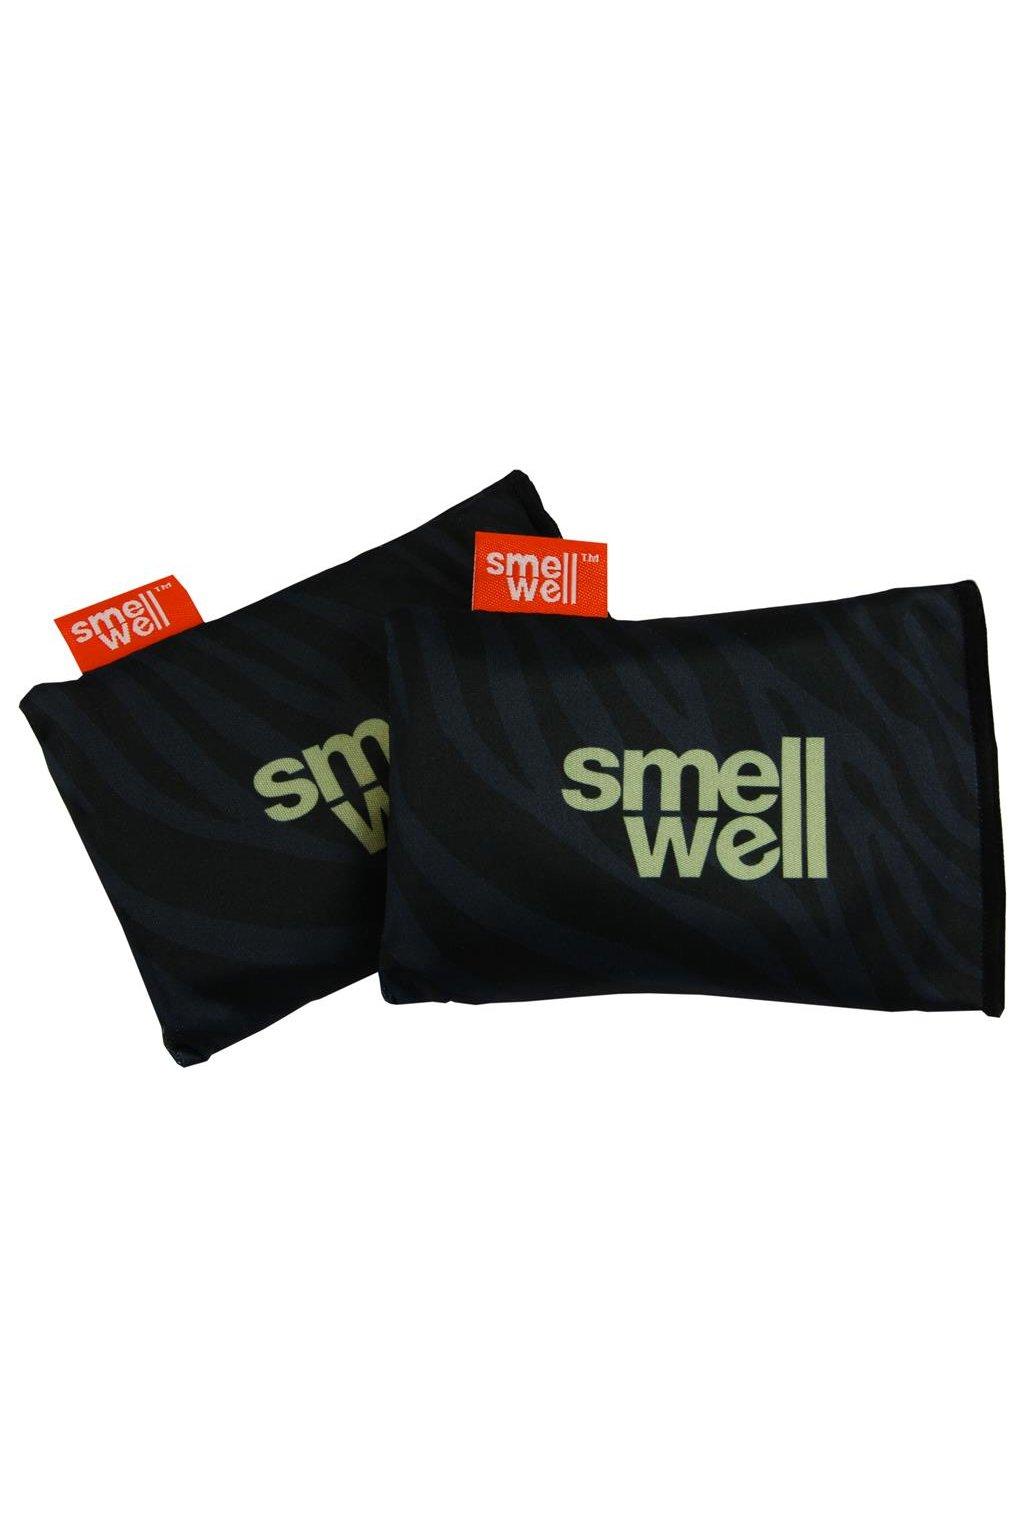 smellwell-active-black-zebra